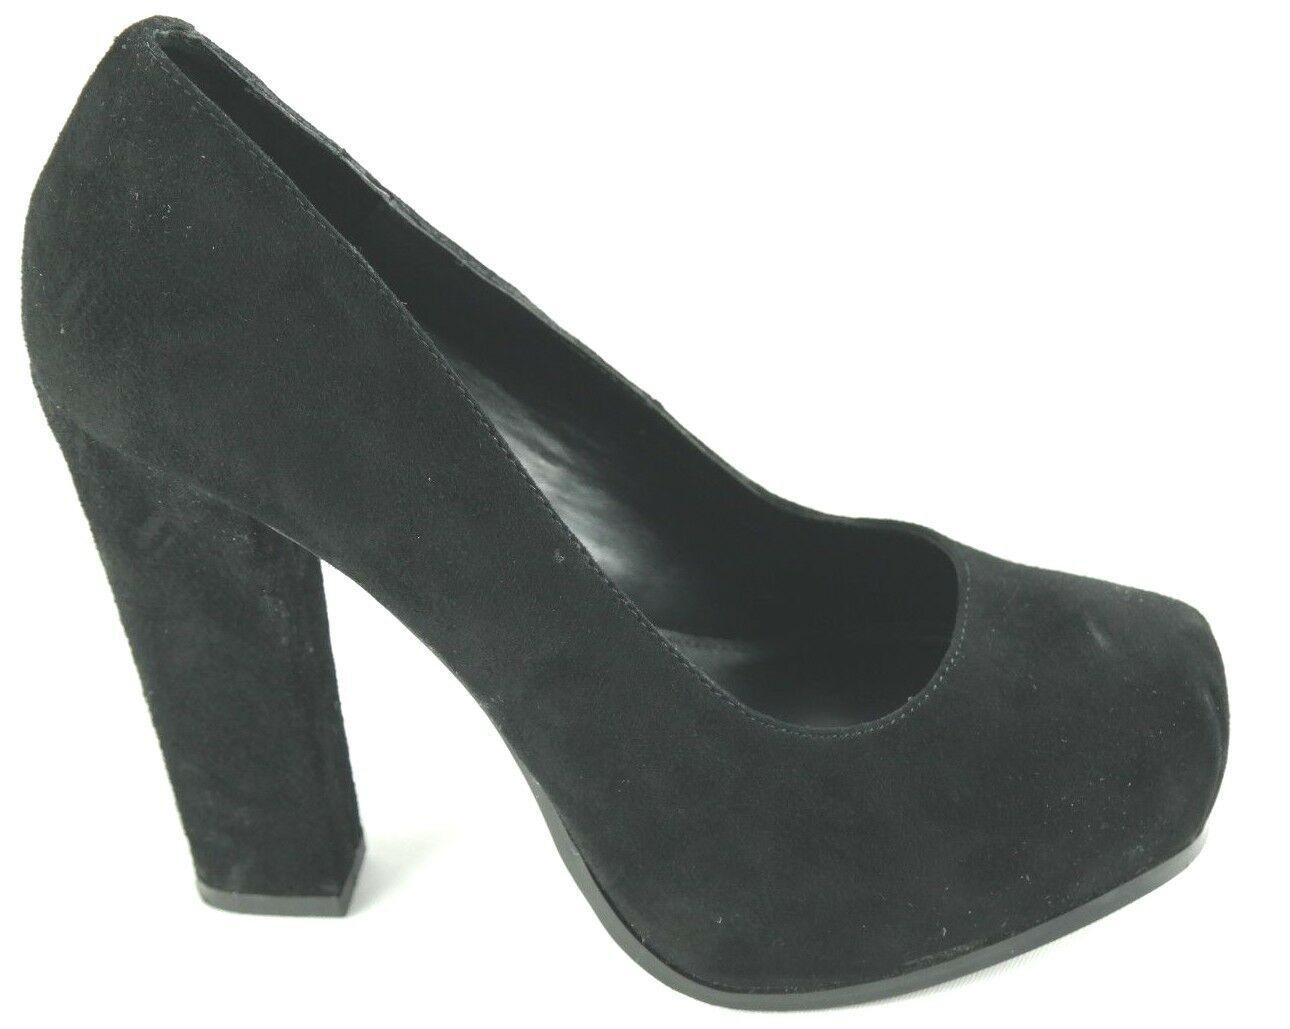 Steve Madden Sarrina Platform Pumps Womens Sz 7.5 Black Suede High Heel Shoes